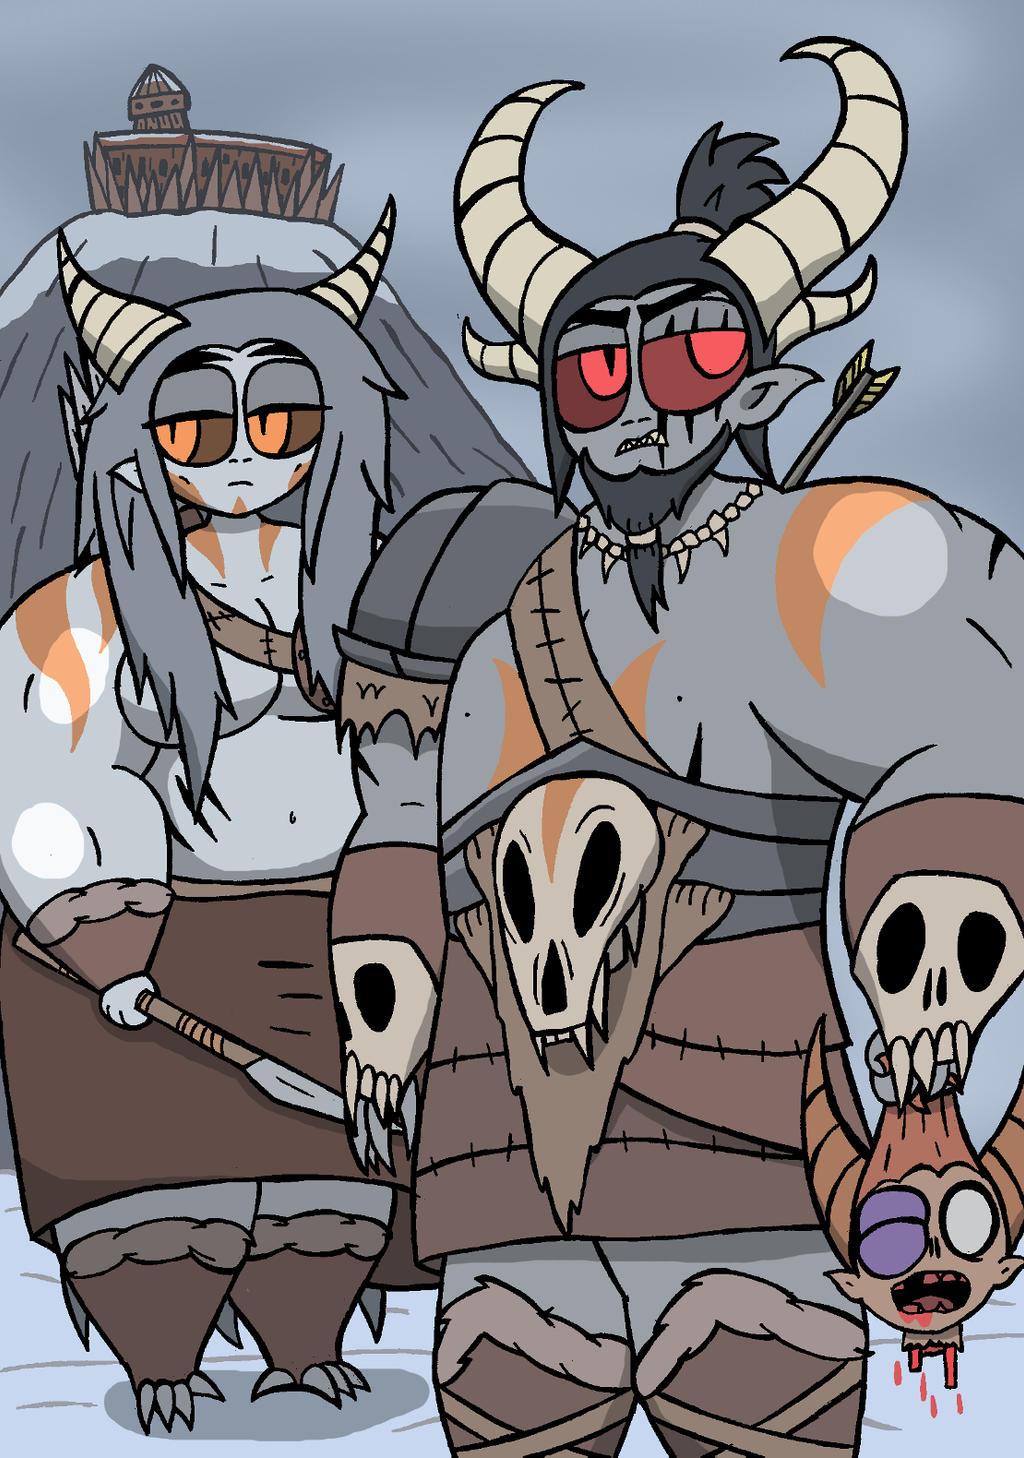 Wendigan Demons by NyxenAvenger